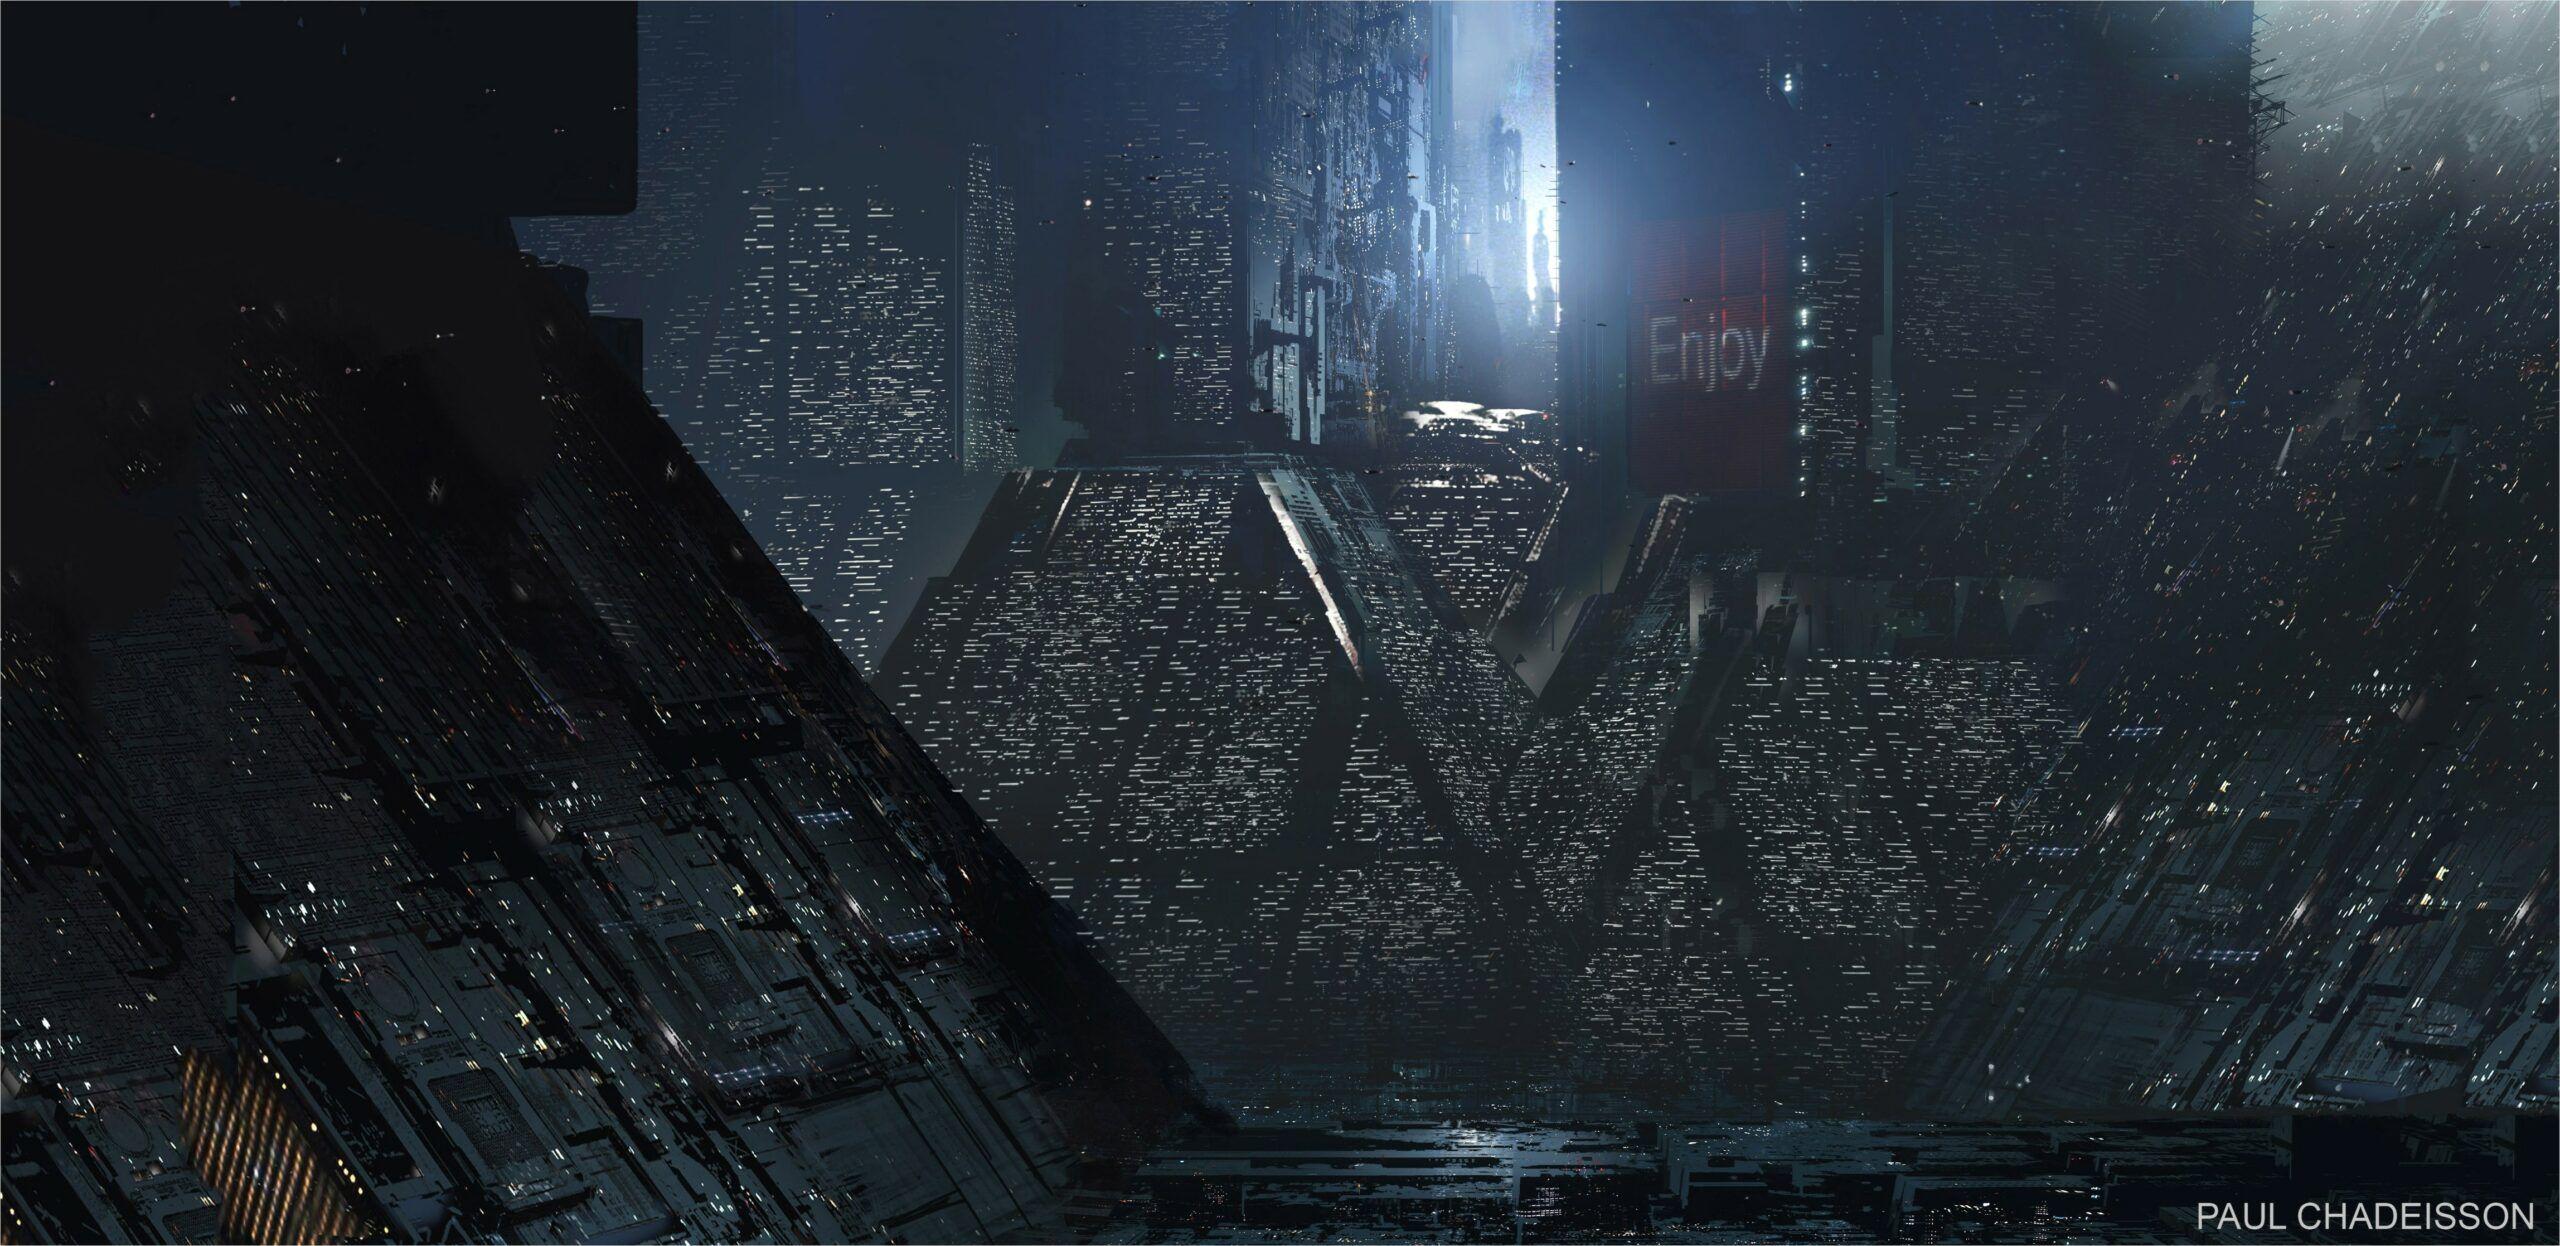 4k Wallpaper Blade Runner Wallpaper Blade Runner Landscape Wallpaper